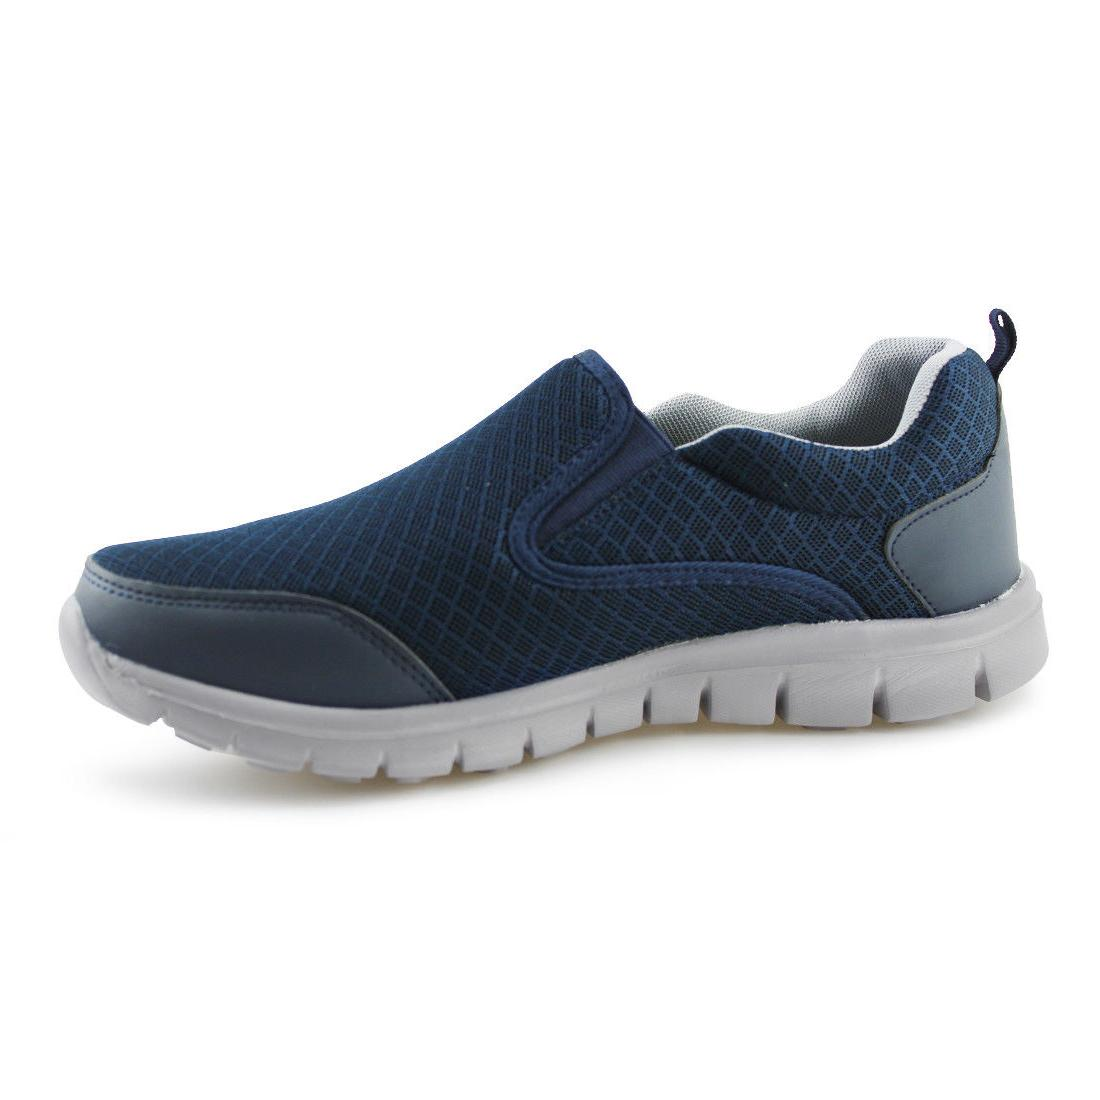 Comfort Loafer Sport Walking Mesh Sneakers